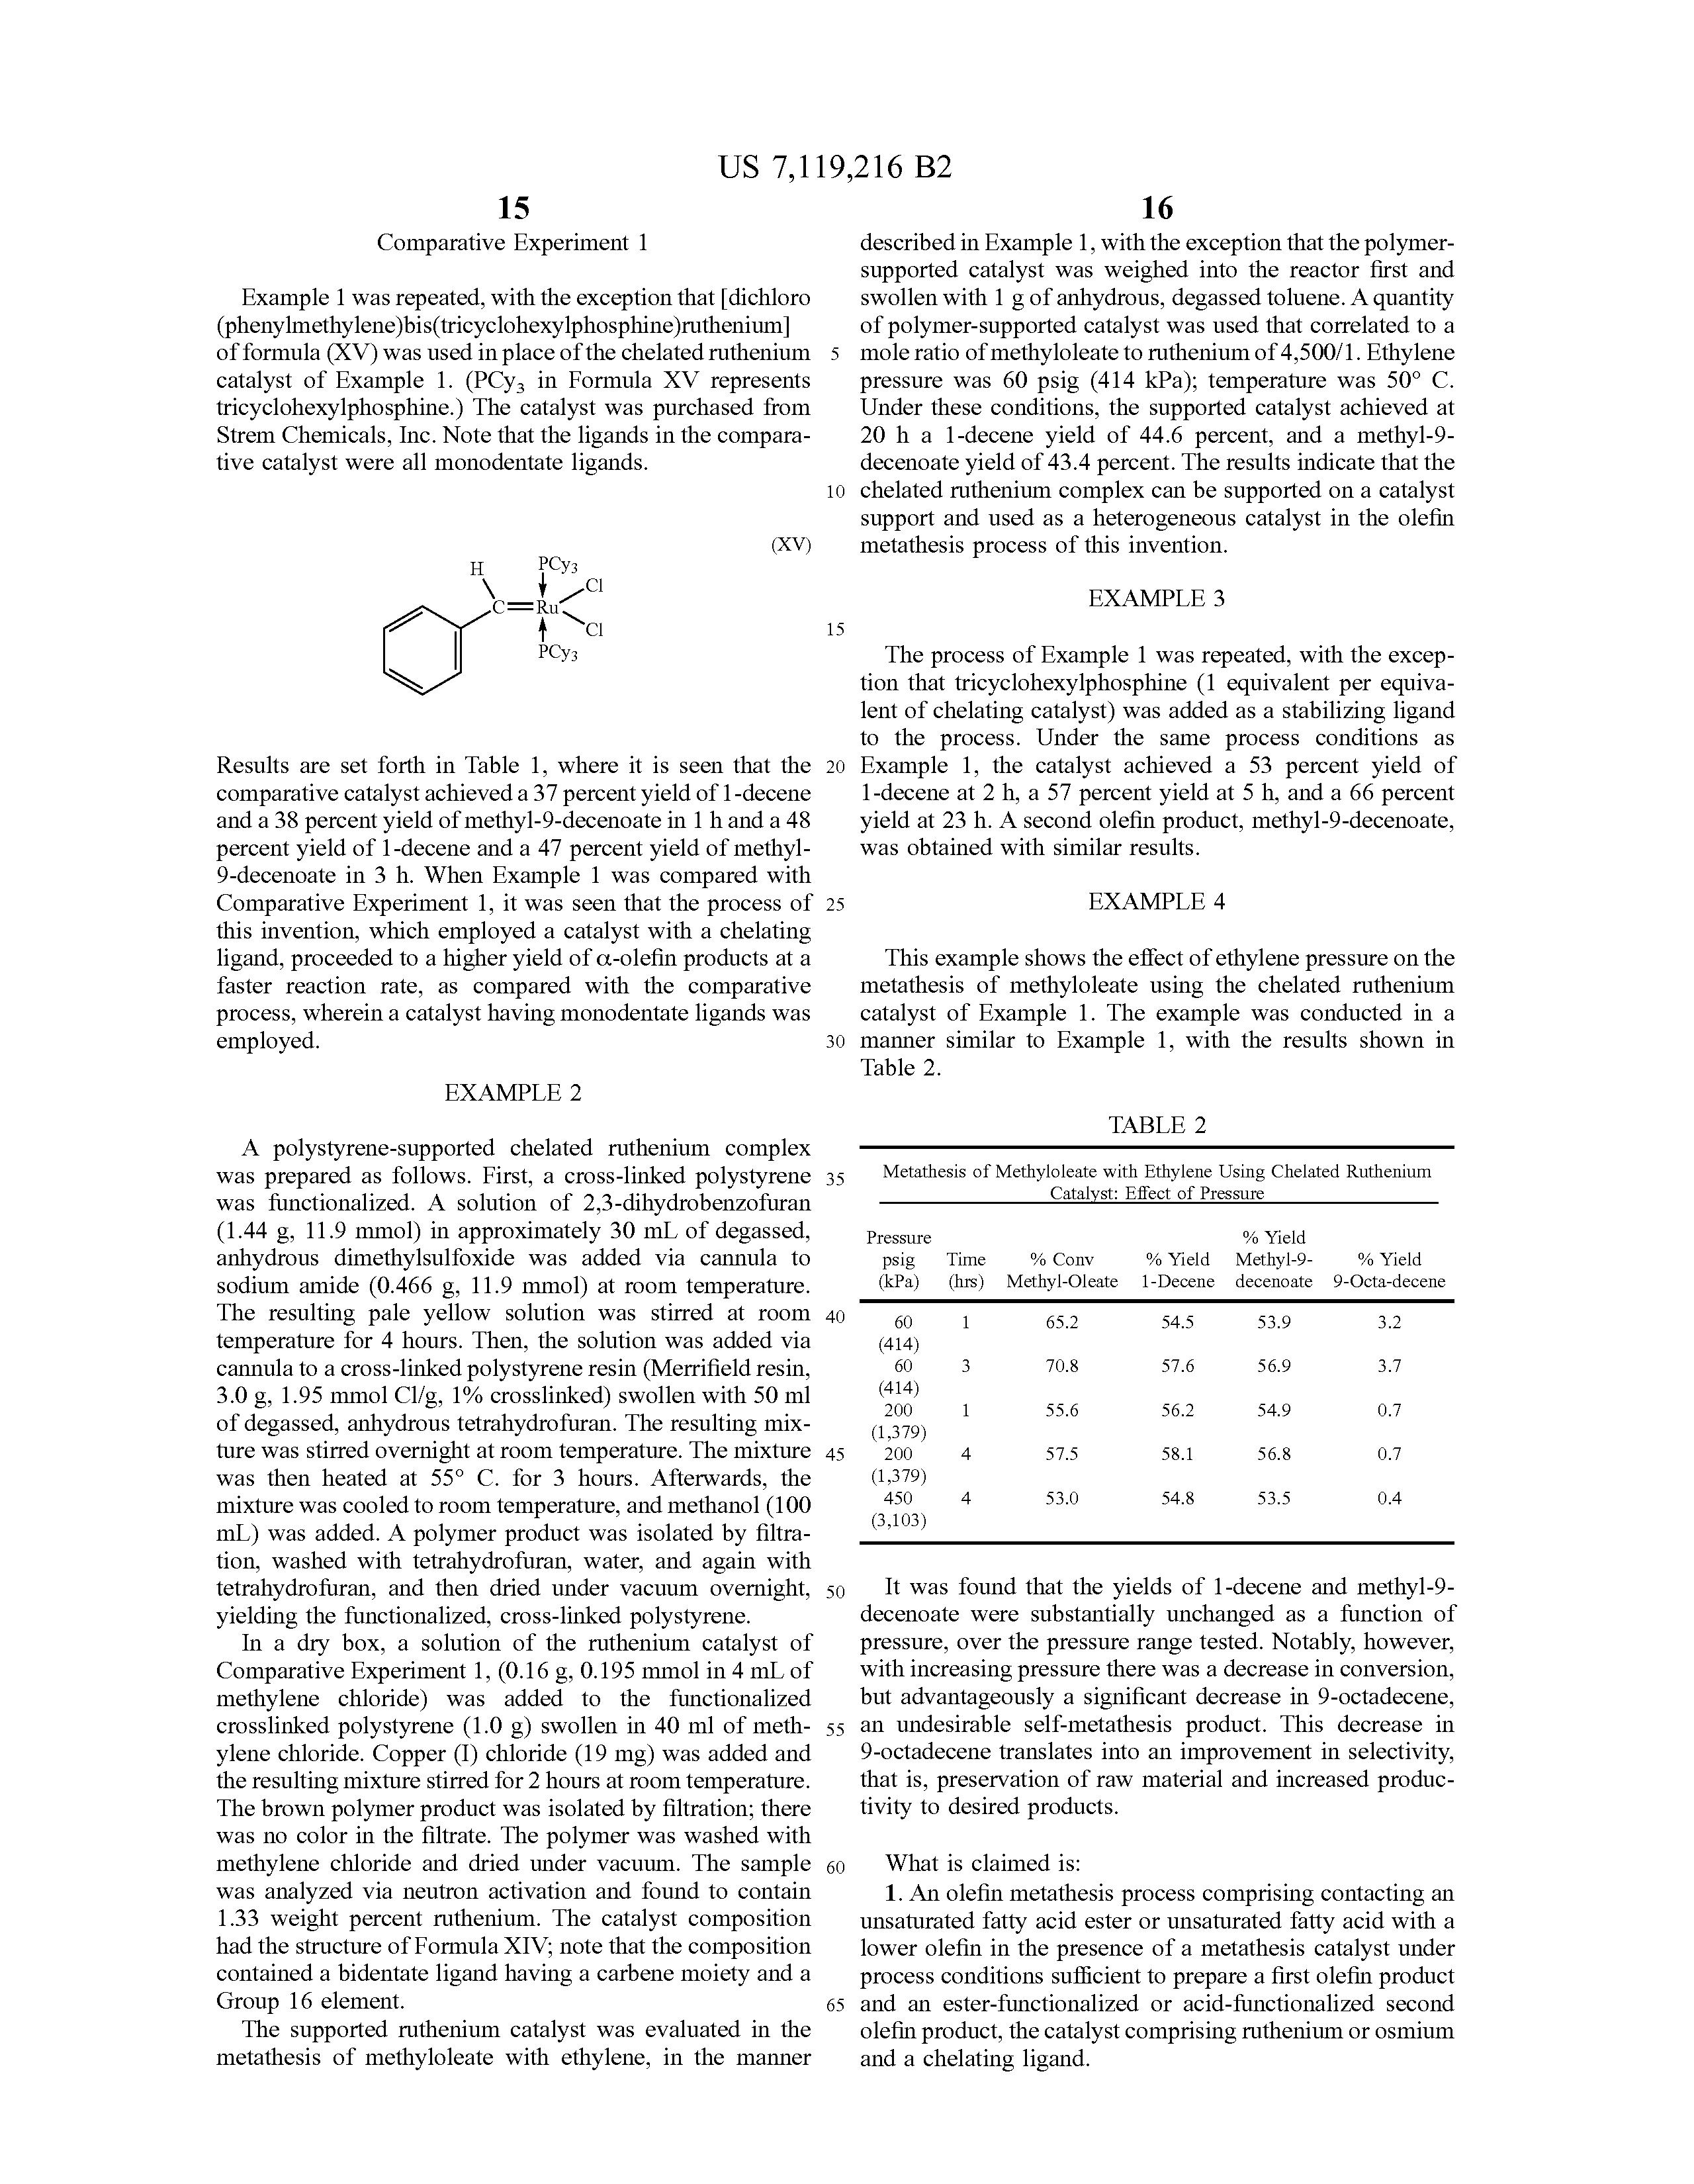 metathesis reactions of fatty acid esters